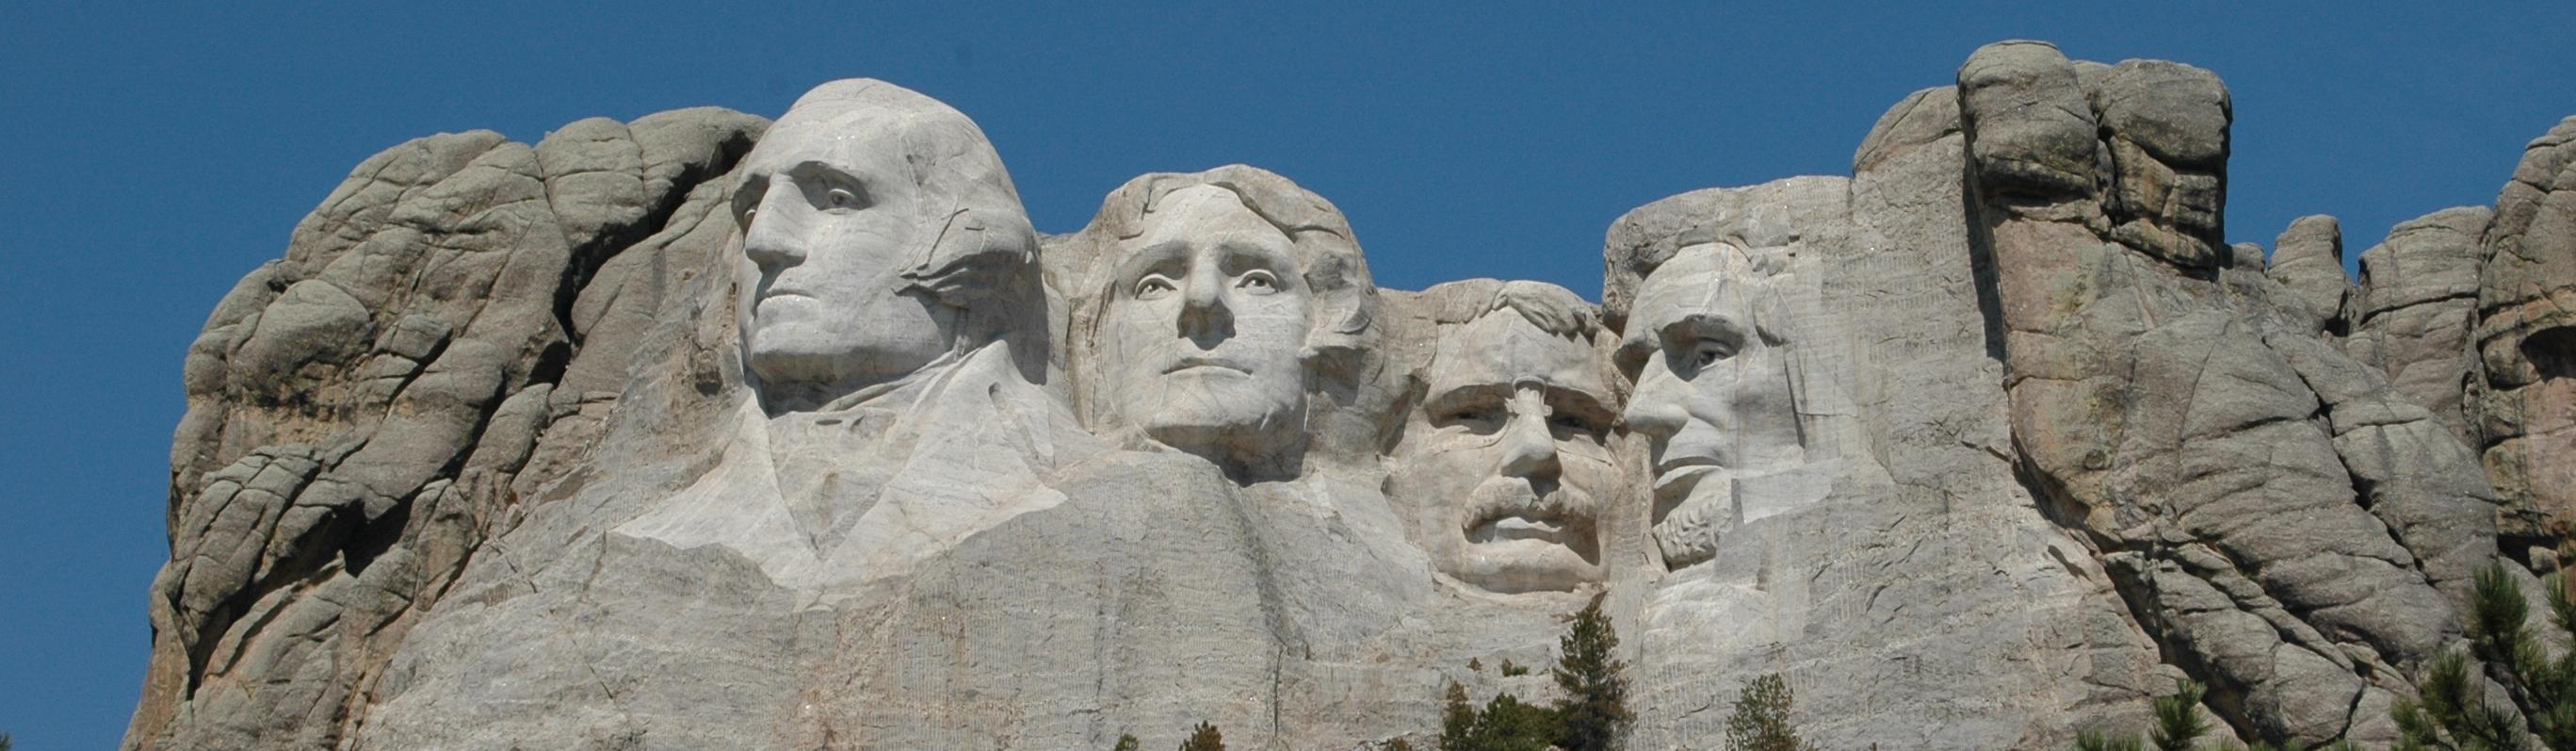 Mount Rushmore National Memorial U S National Park Service